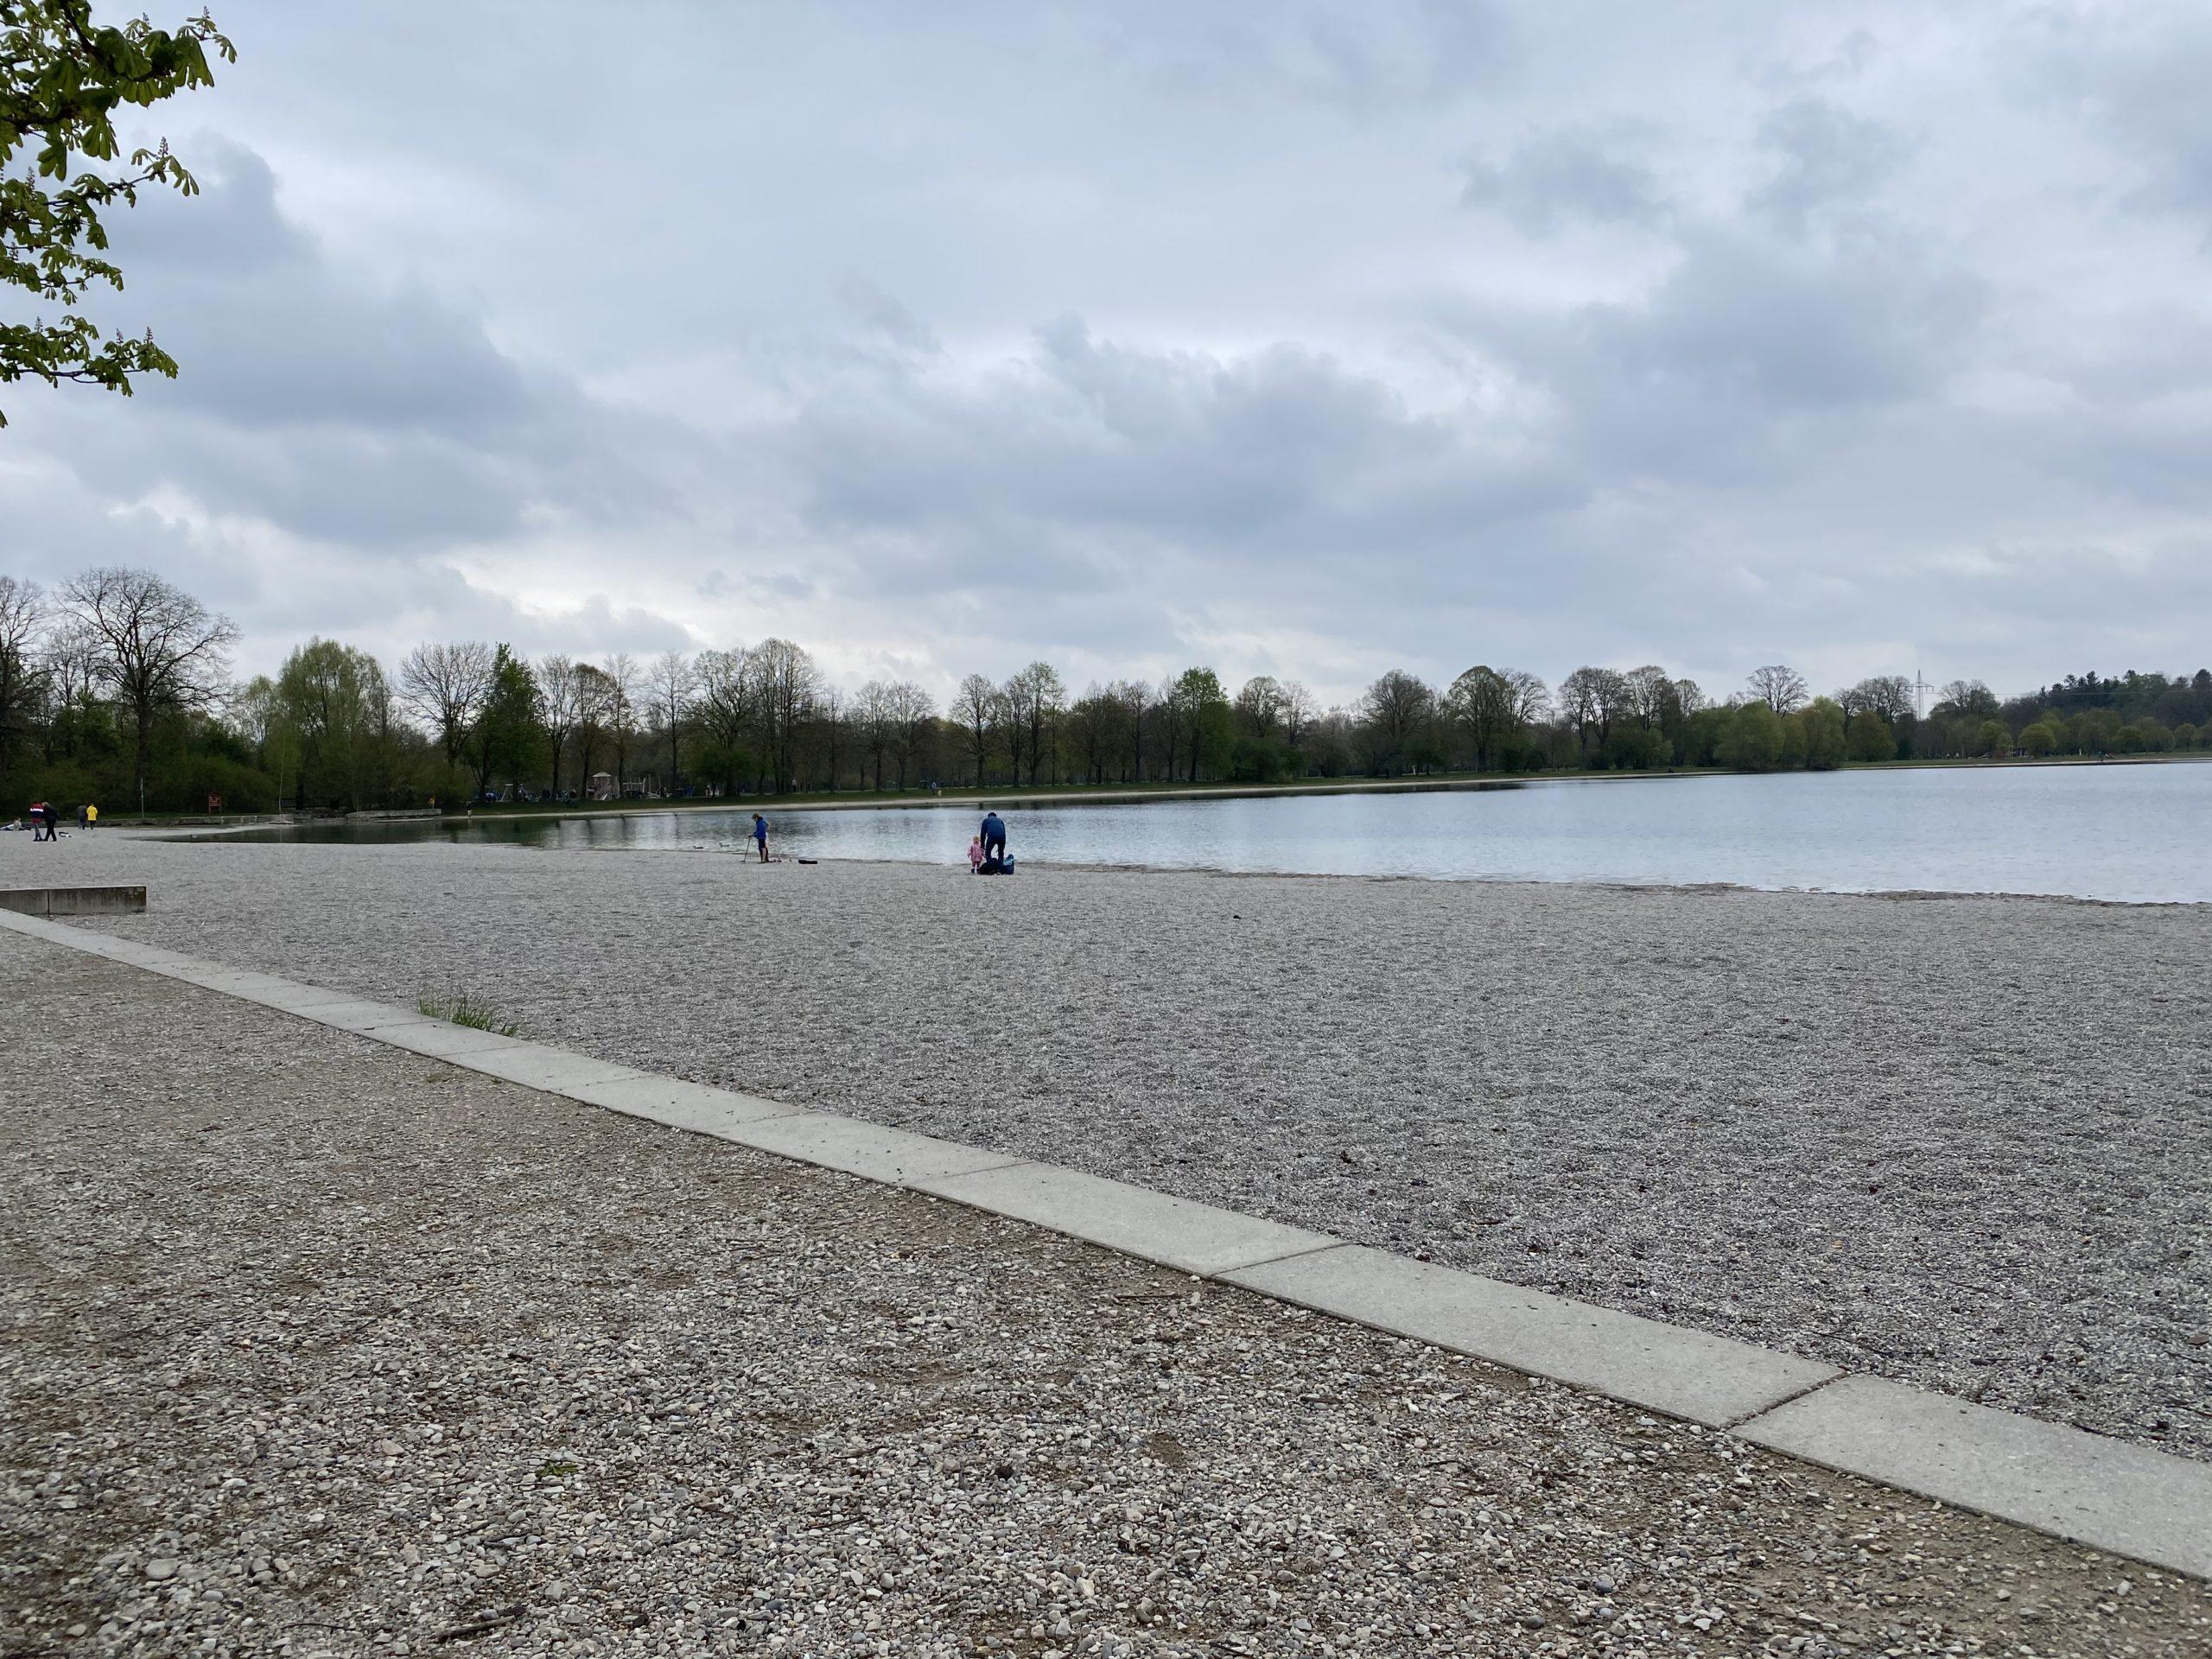 Beach at the Lußsee